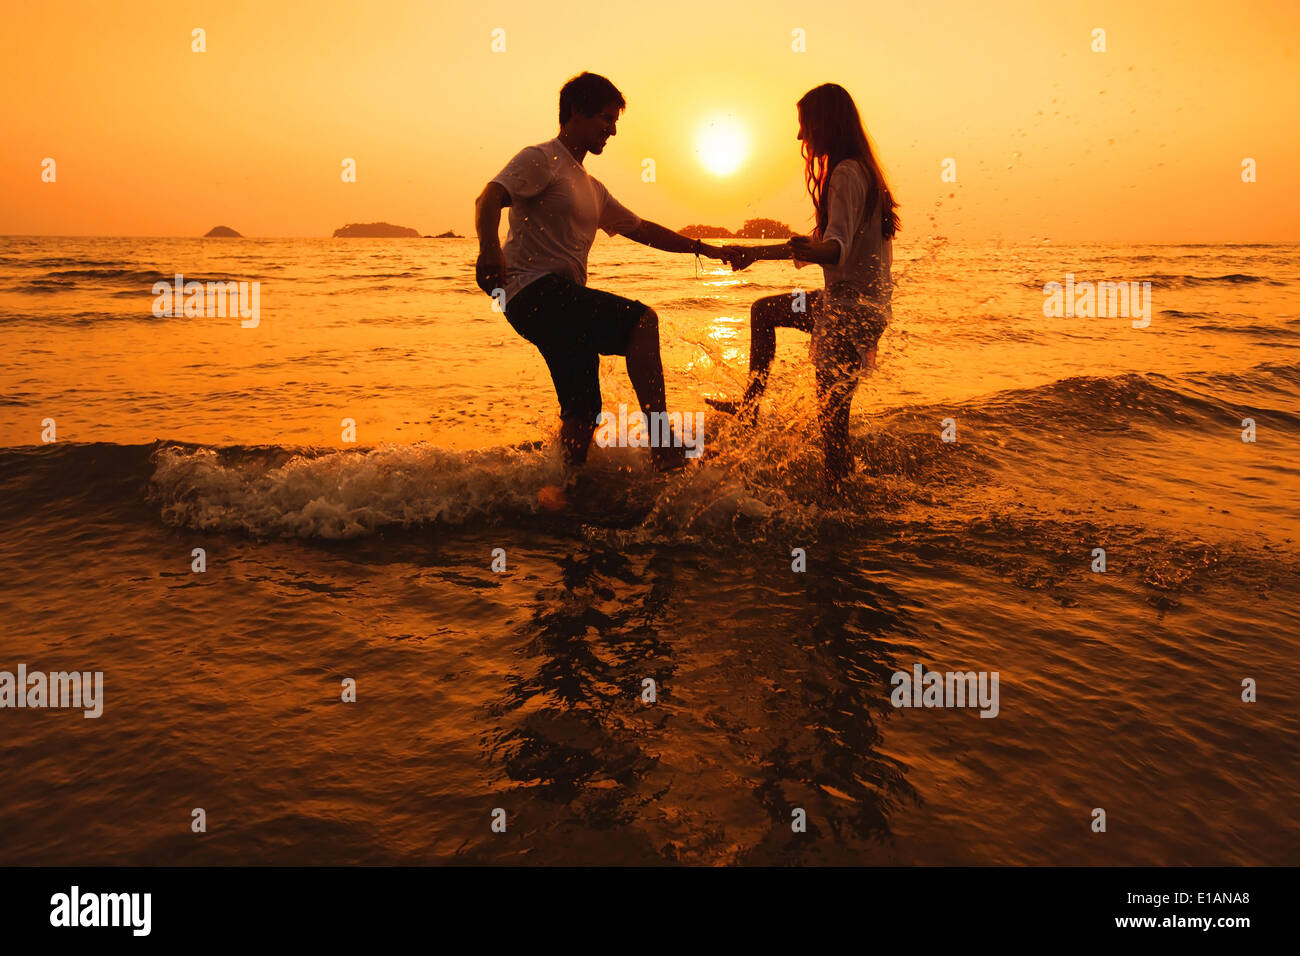 Par de divertirse en el mar en sunset beach Imagen De Stock